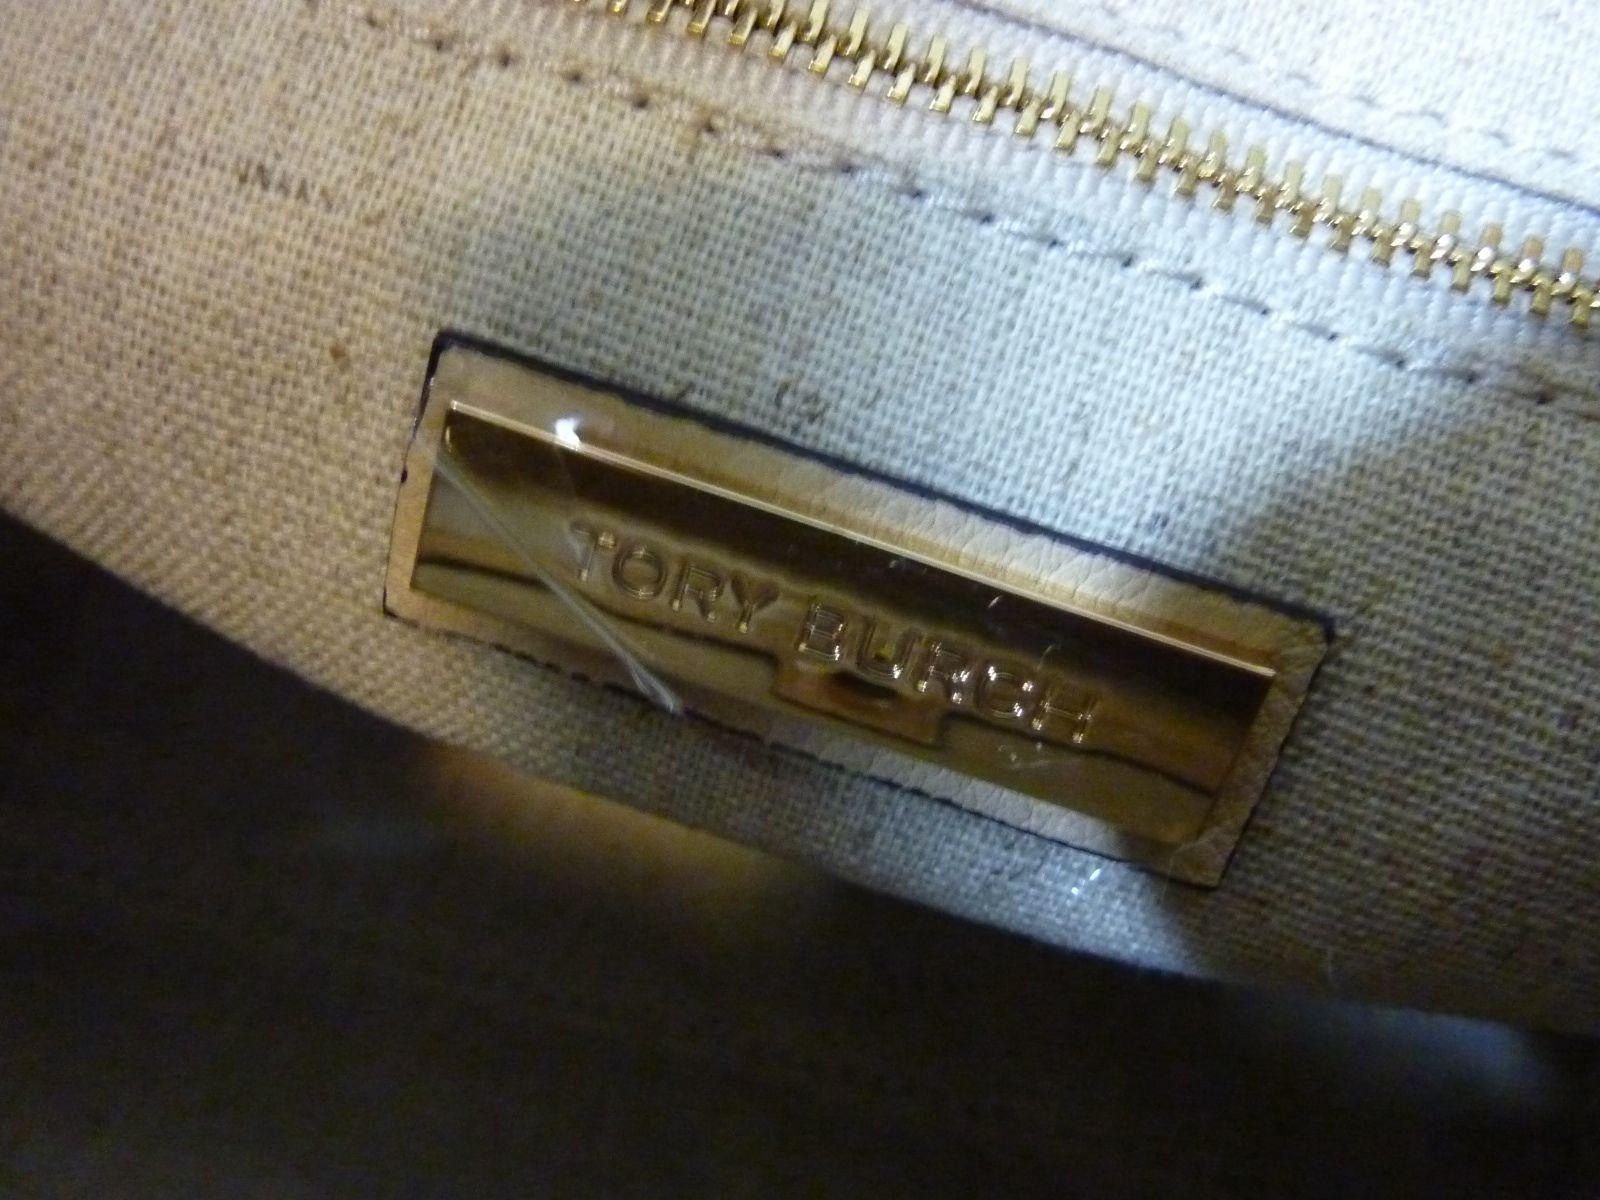 NWT Tory Burch Sand Dune Leather Small Half-Moon Satchel $495